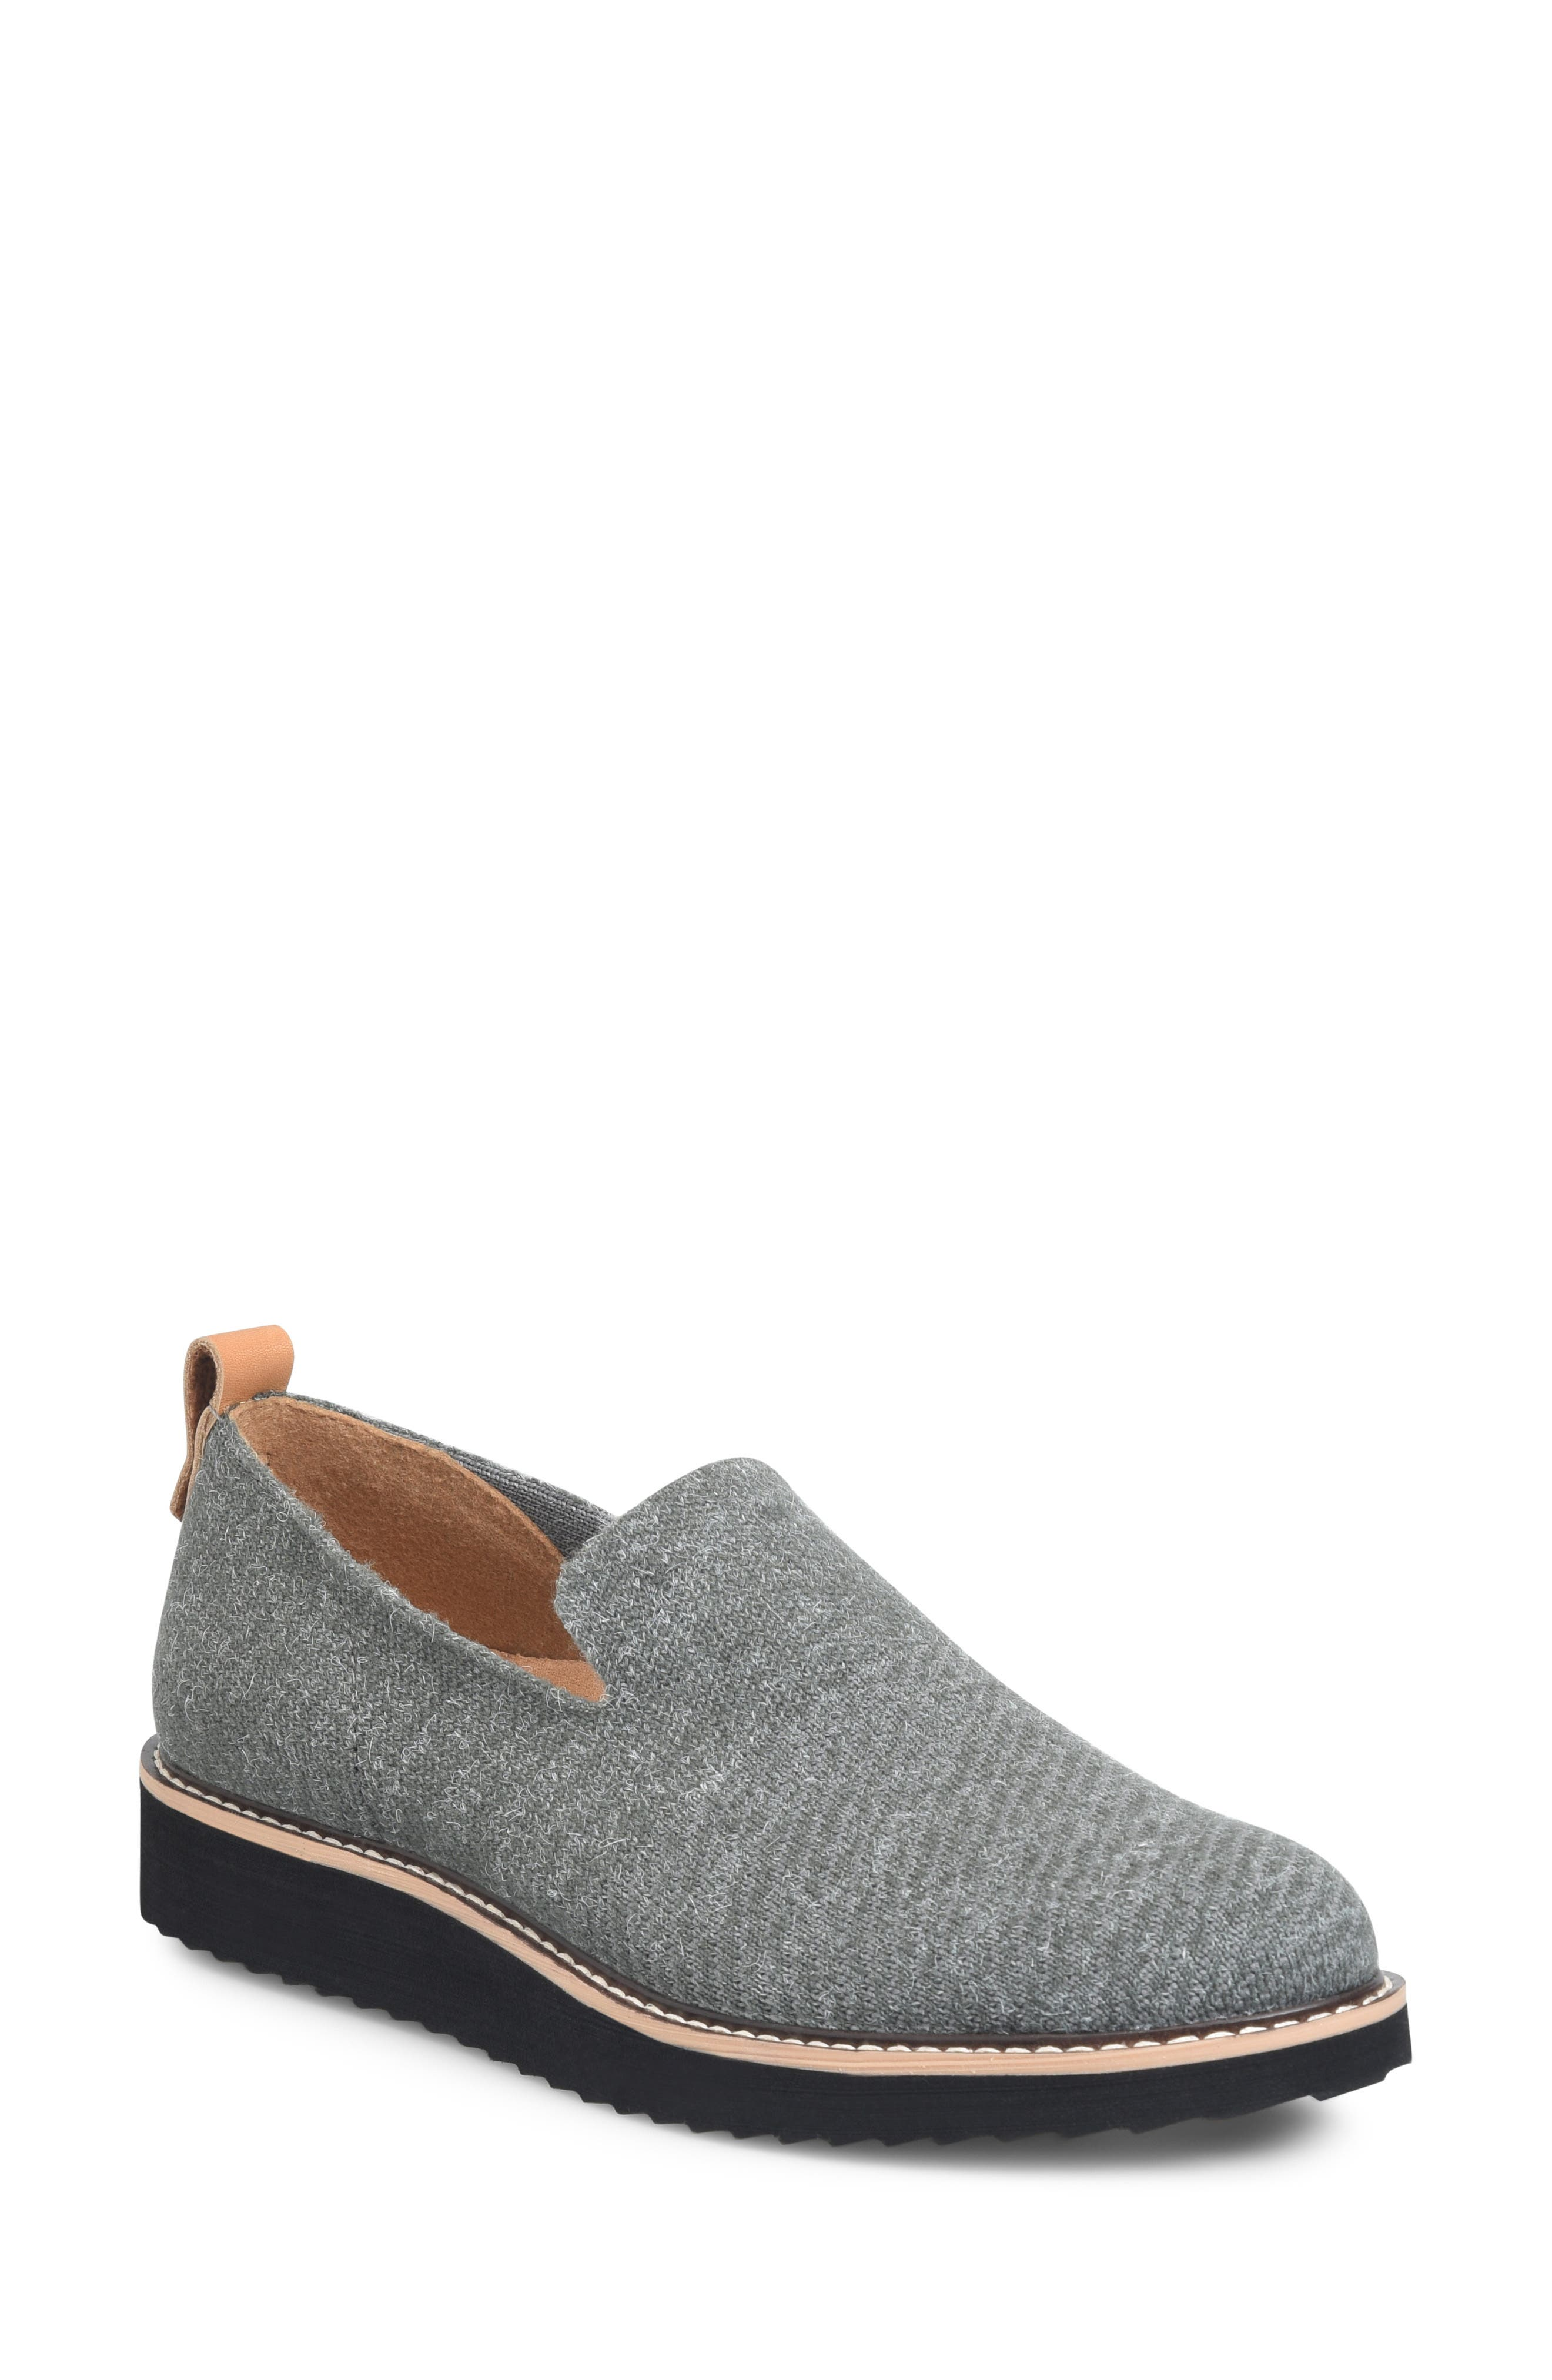 Lelan Sweater Knit Loafer